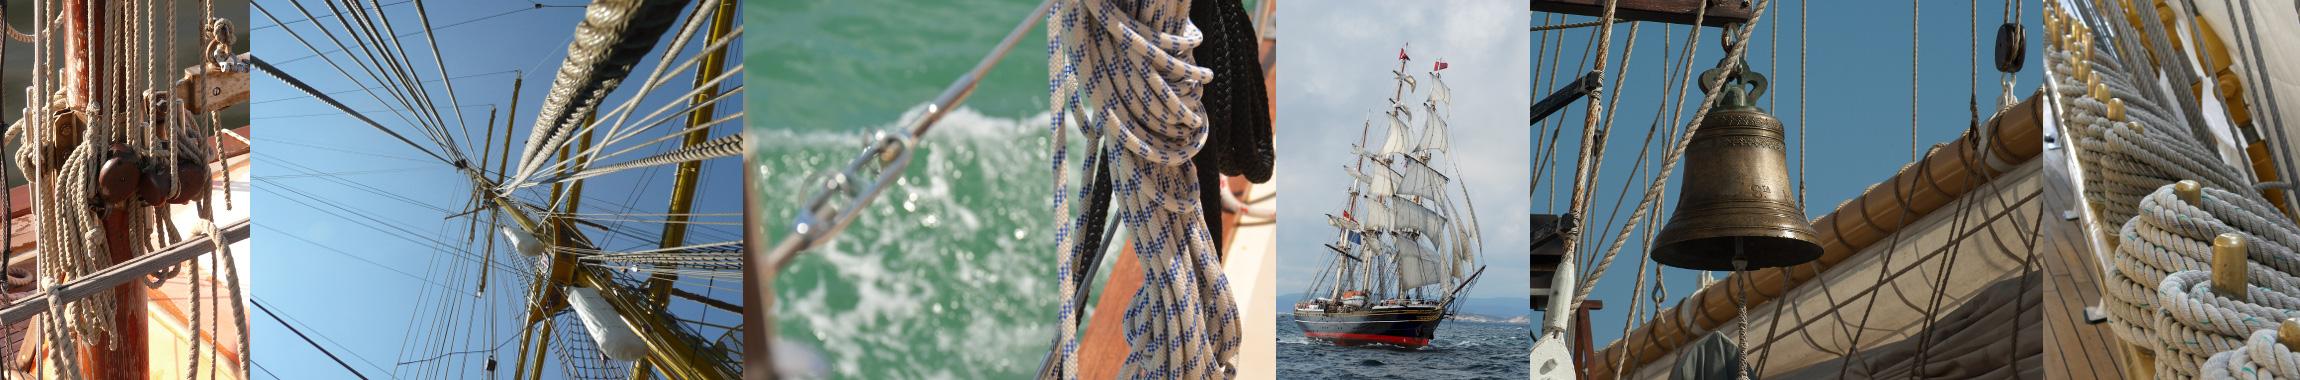 Boots- / Yachttauwerk